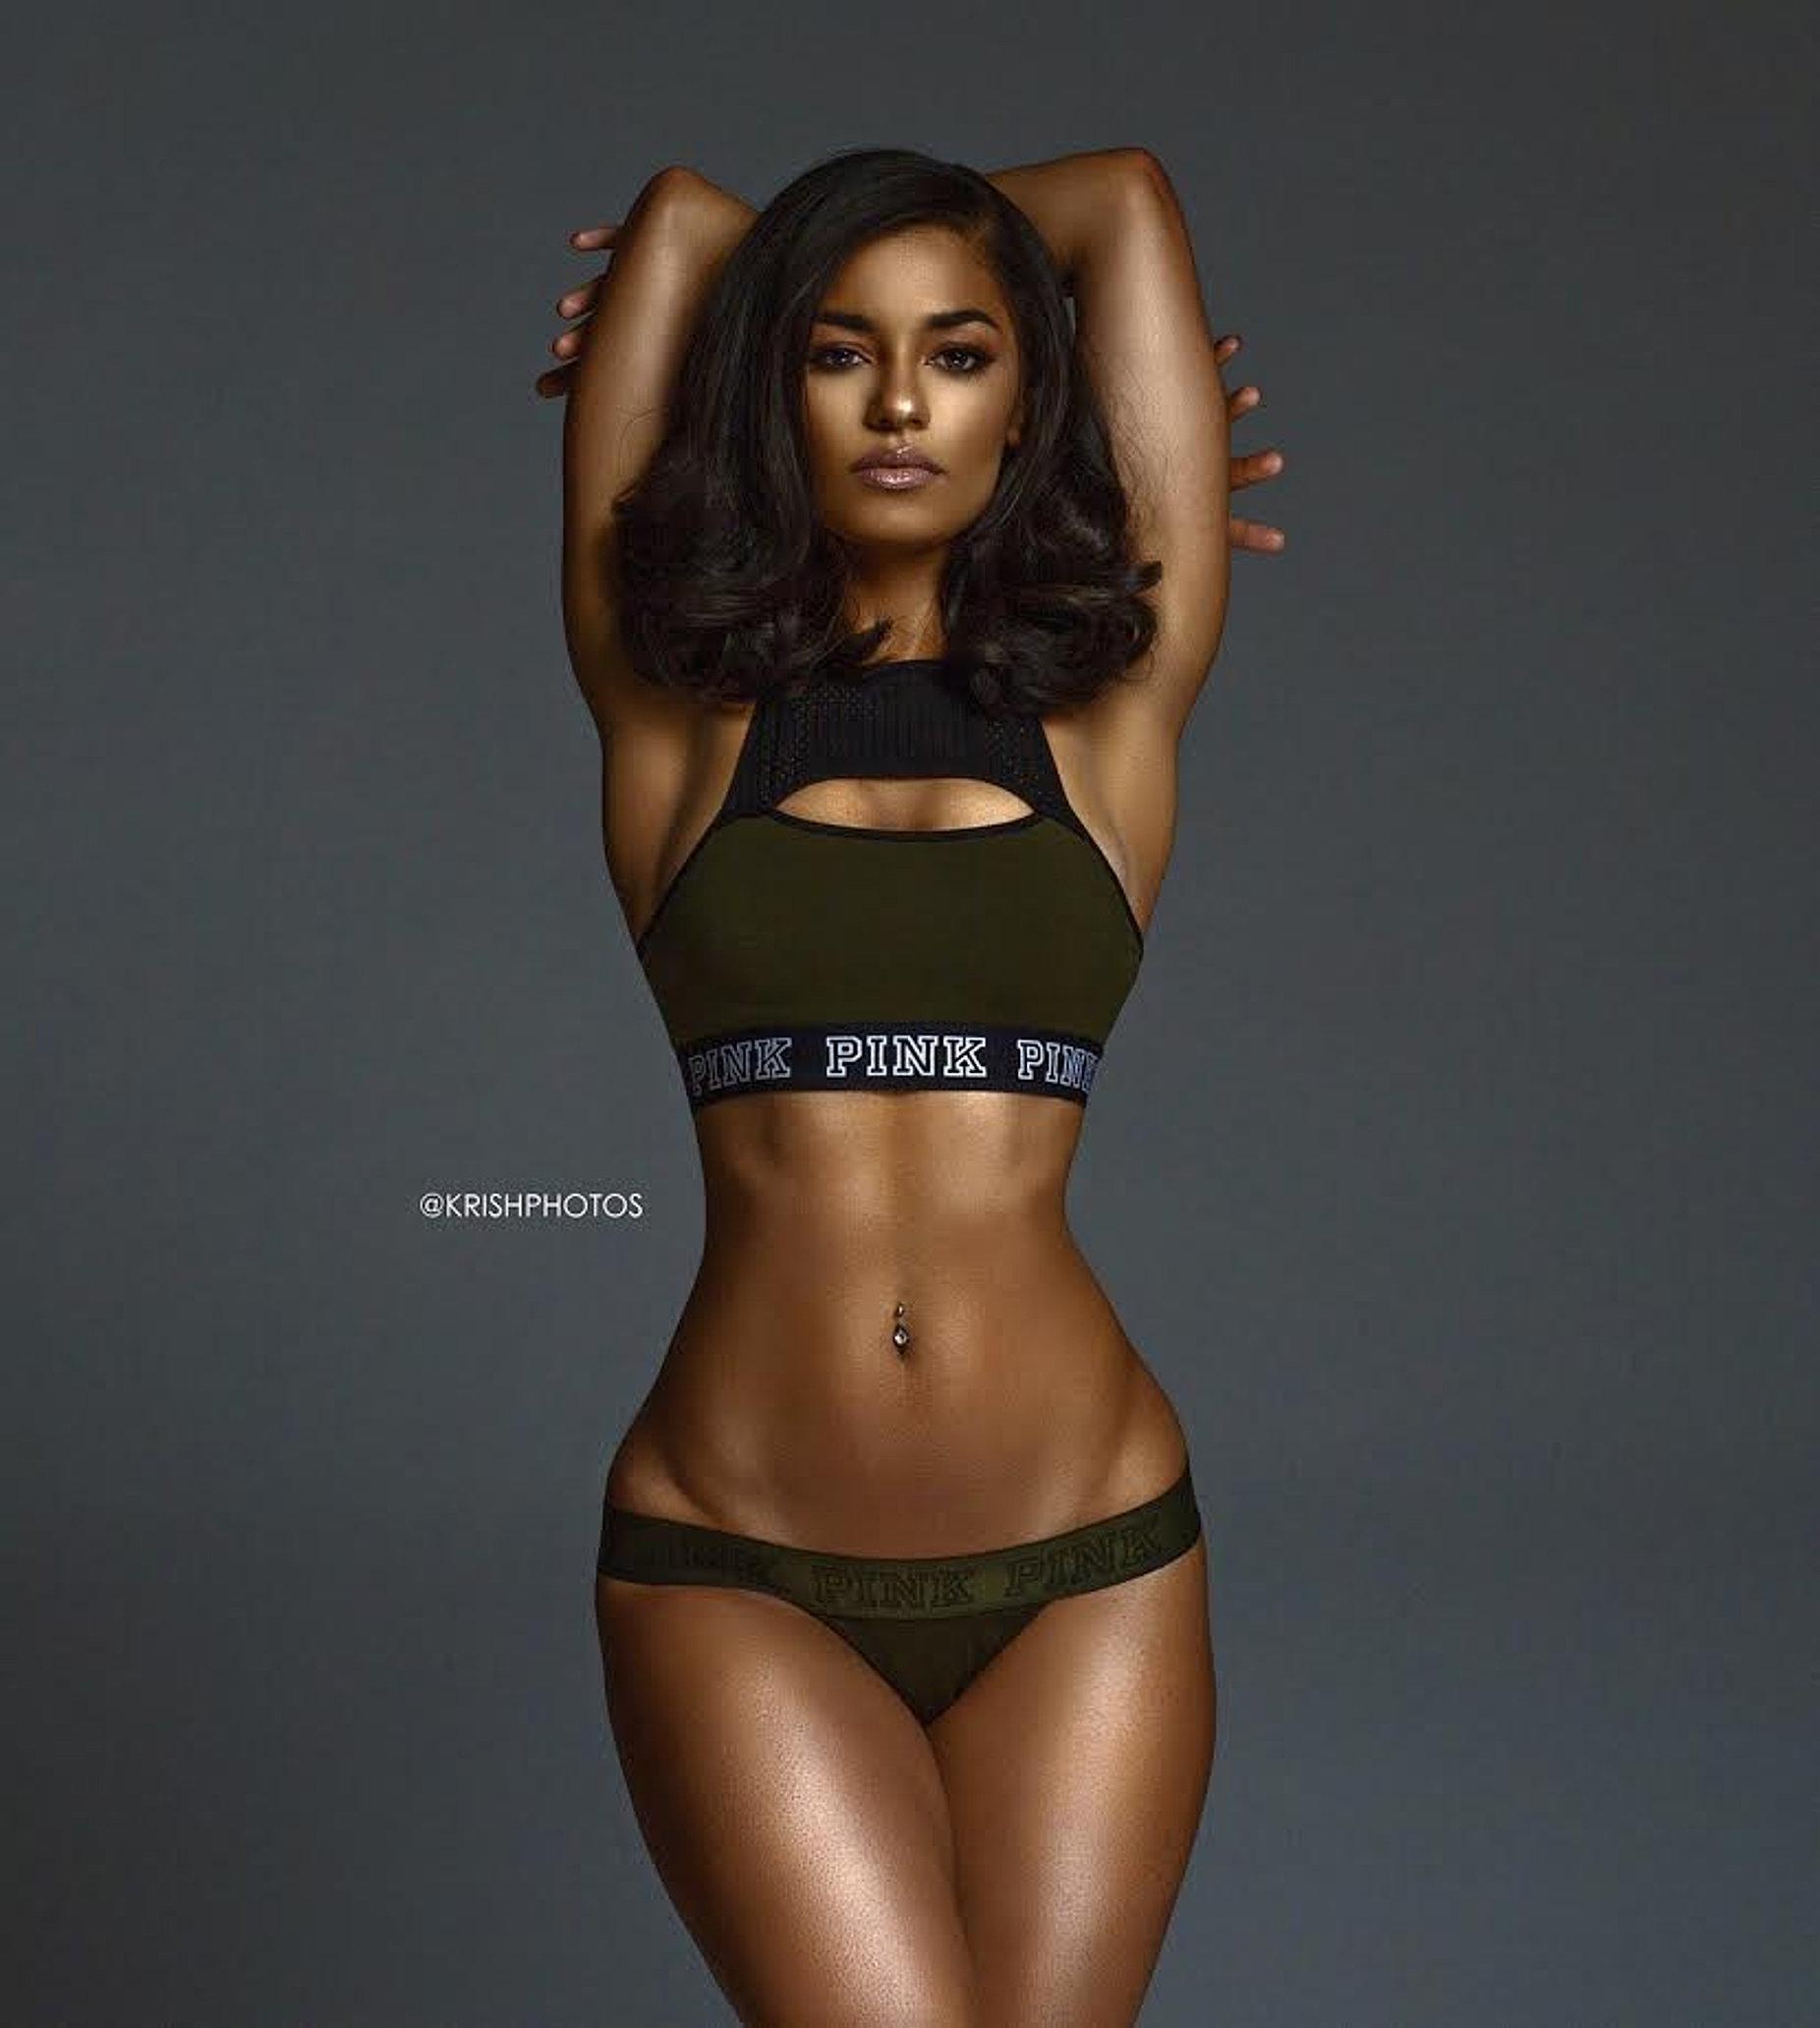 Kelsey Adams Official Website Fitness